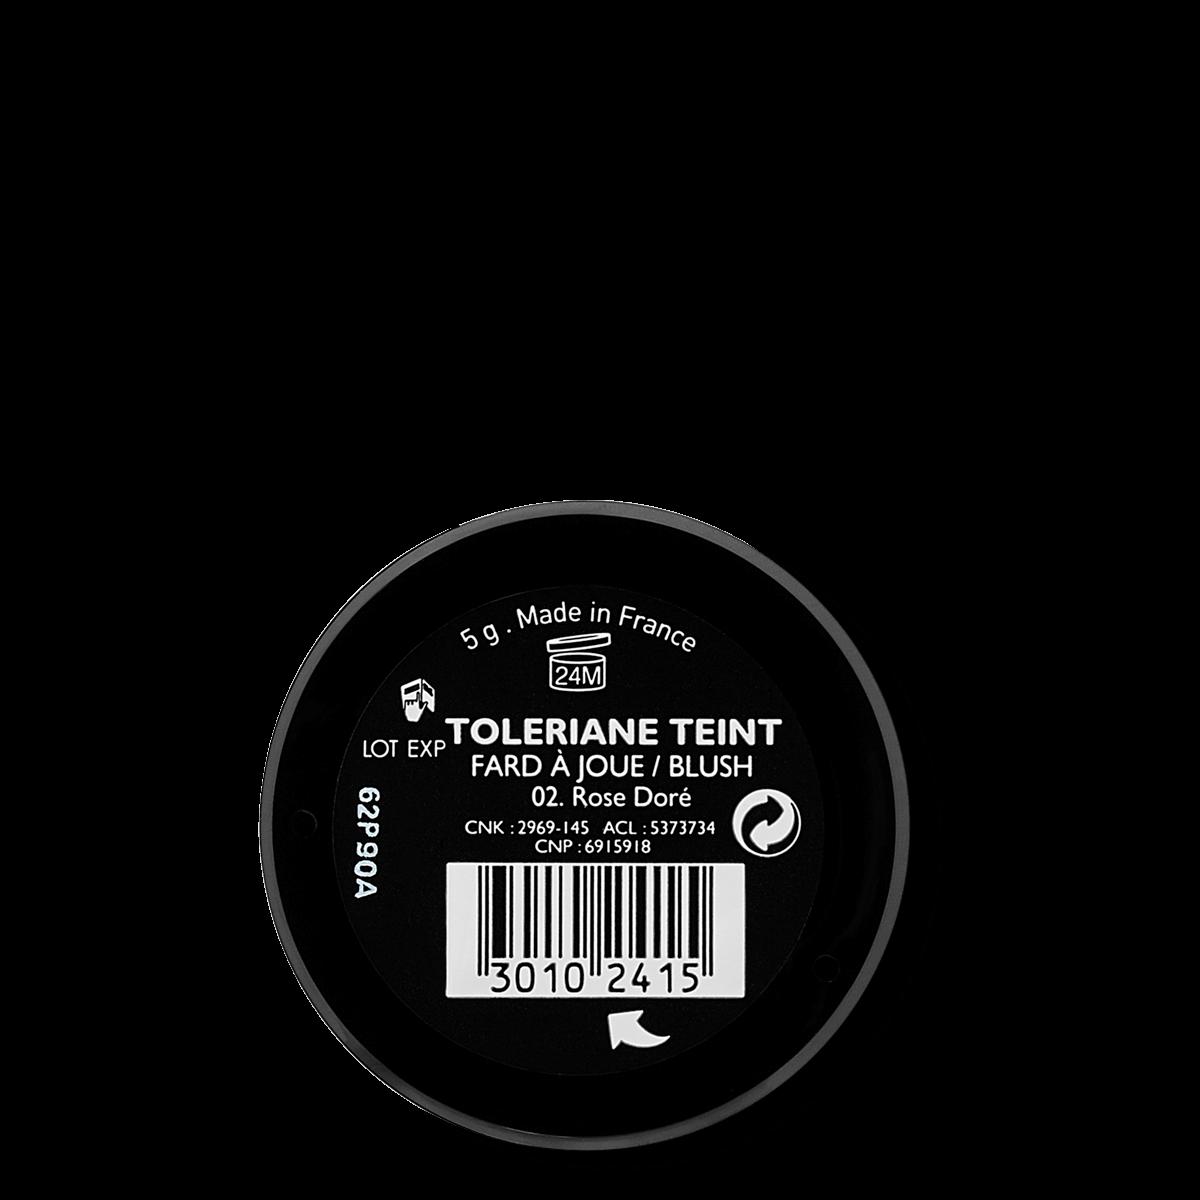 La Roche Posay Sensitive Toleriane Make up BLUSH_GoldenPink 30102415 B